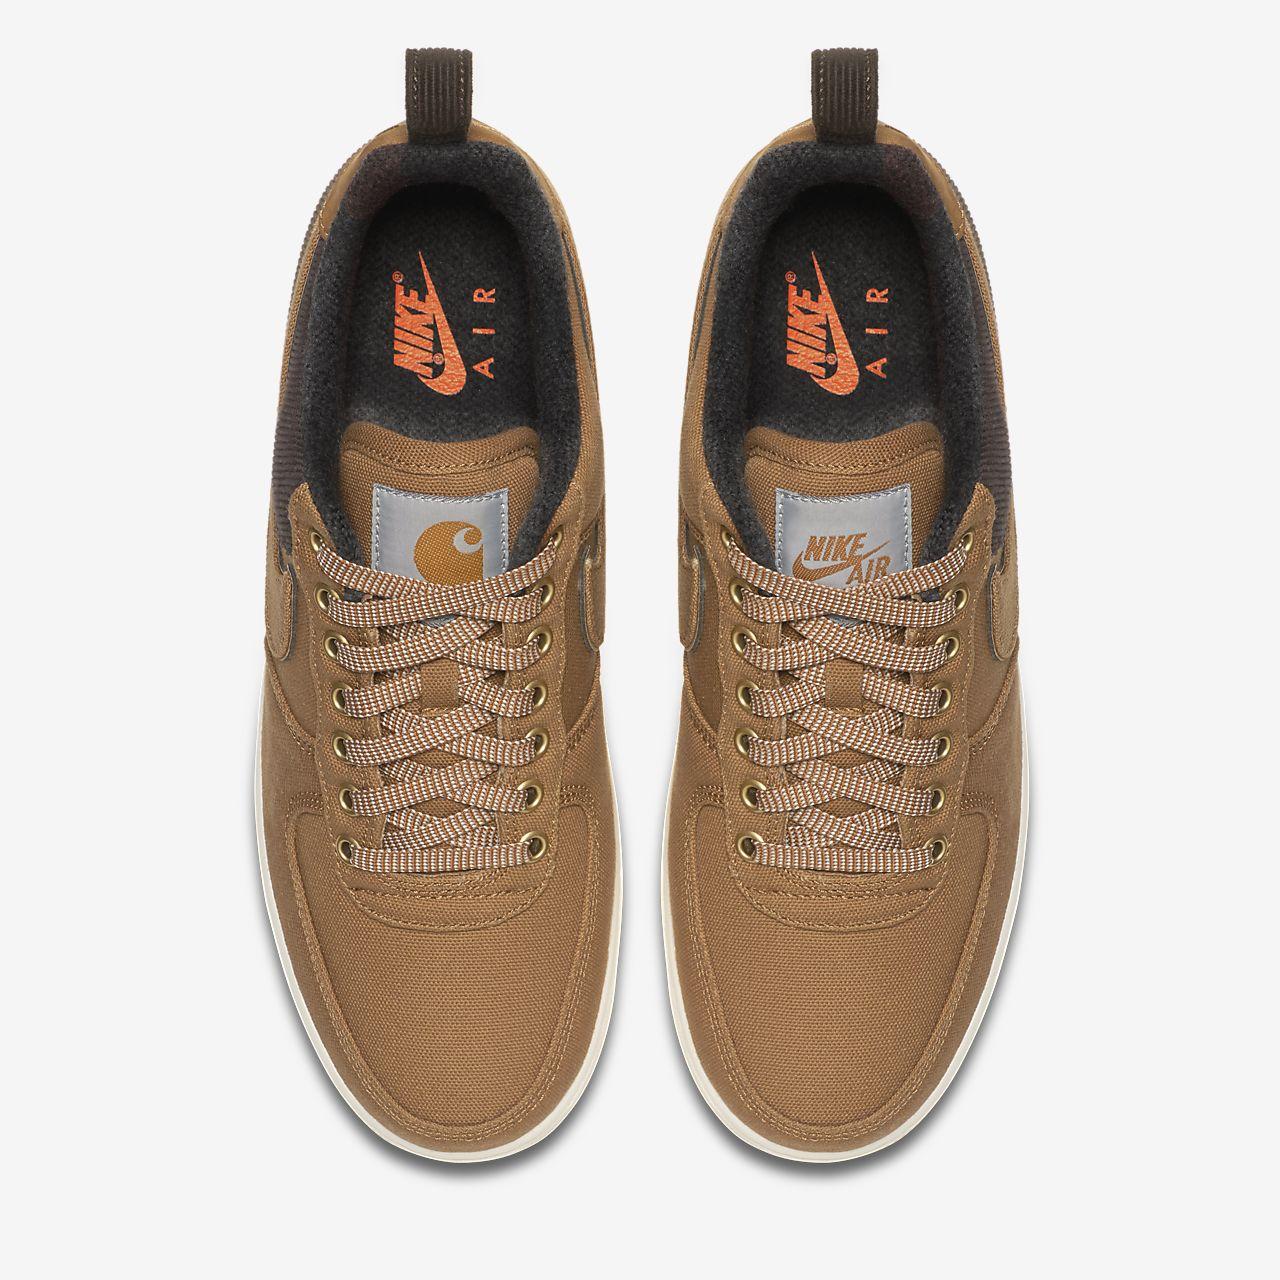 f79e90ee466 Nike x Carhartt WIP Air Force 1 Men s Shoe. Nike.com GB